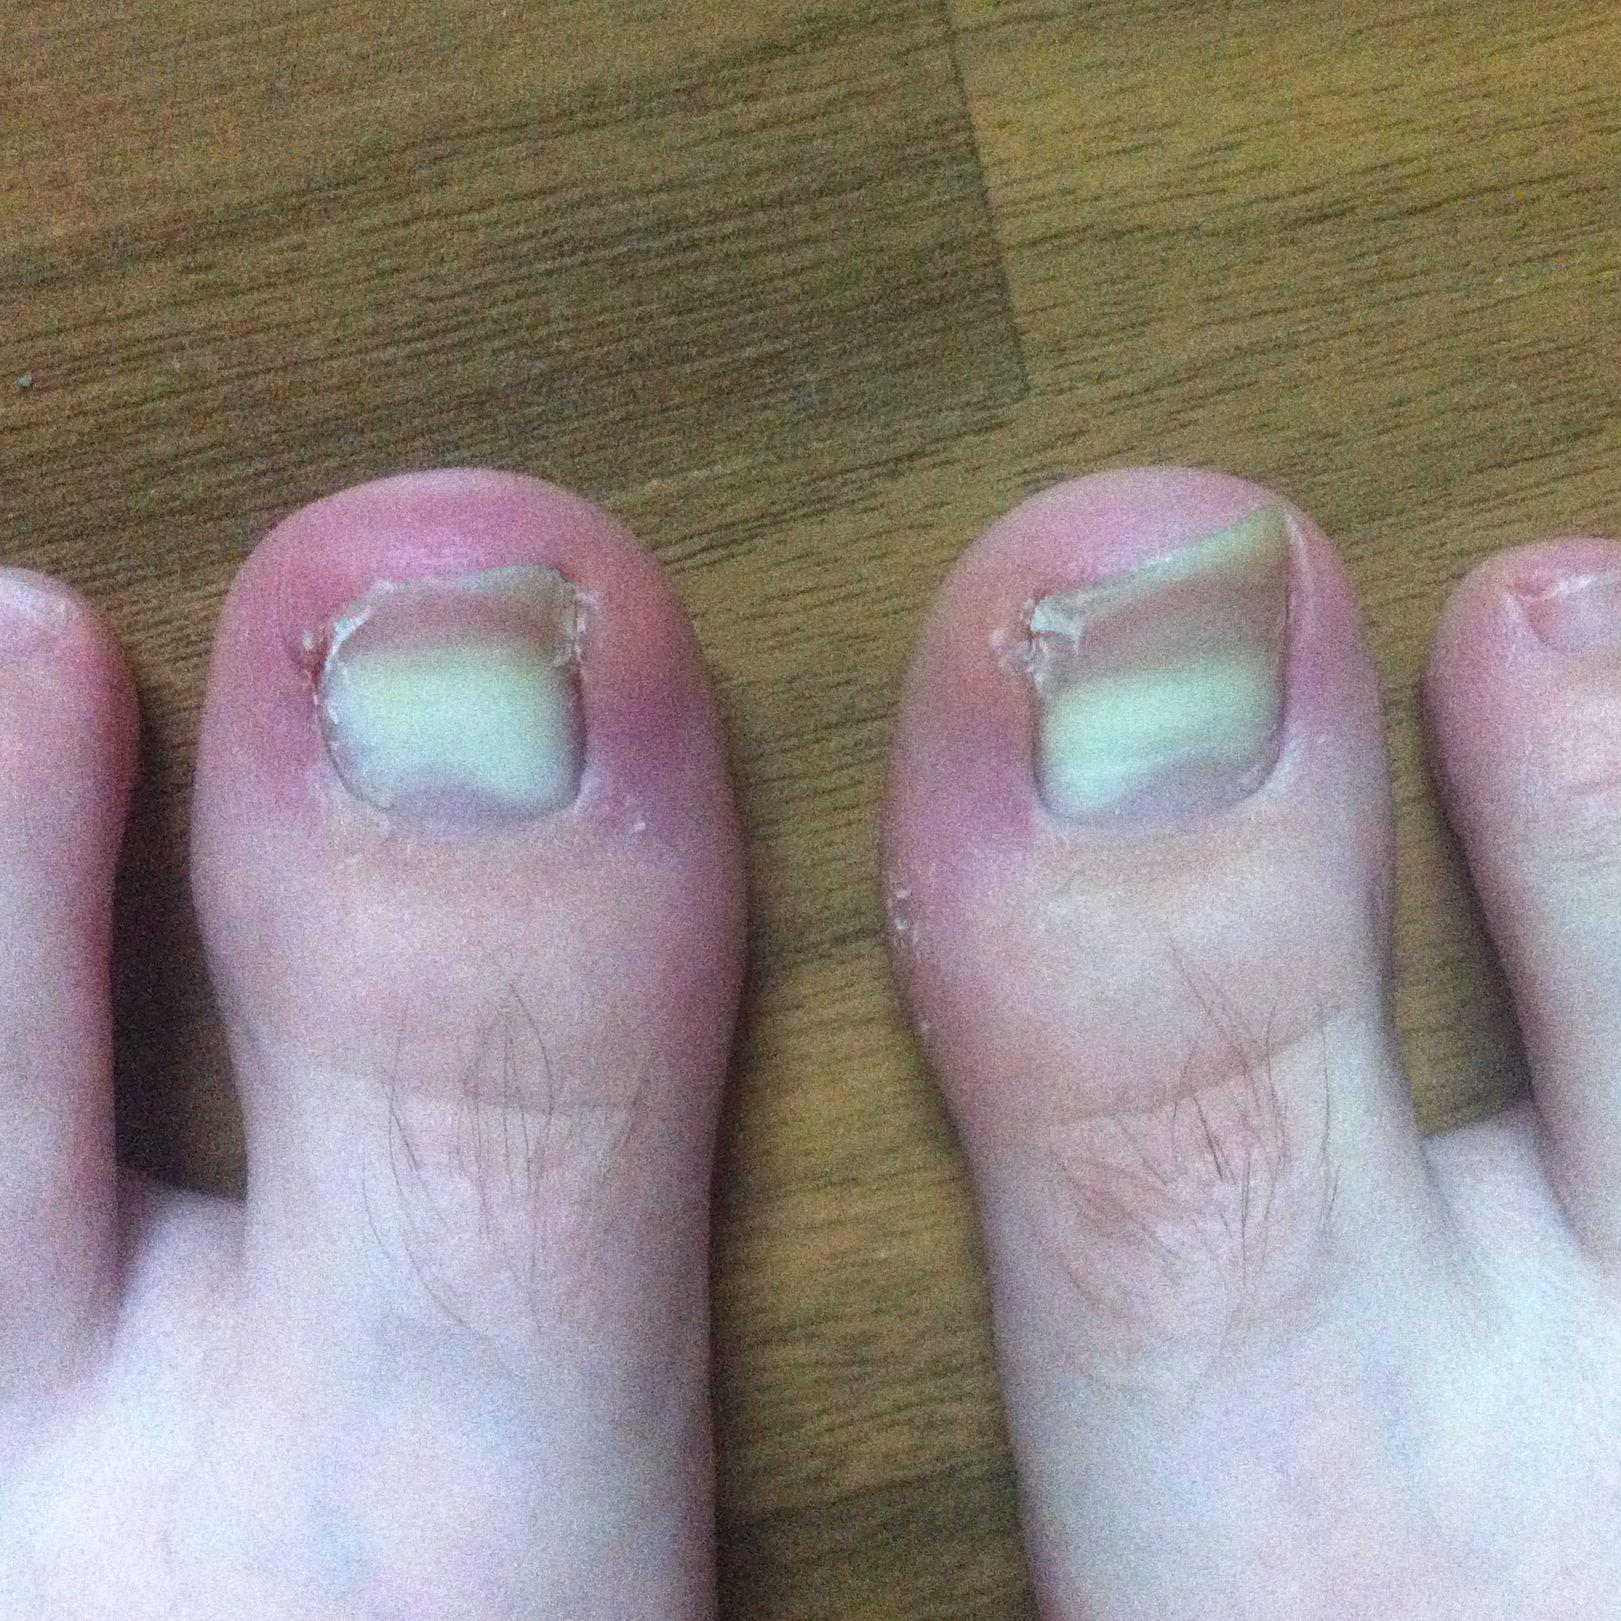 Weiße Verfärbung an Zehenägeln? (zehennägel)